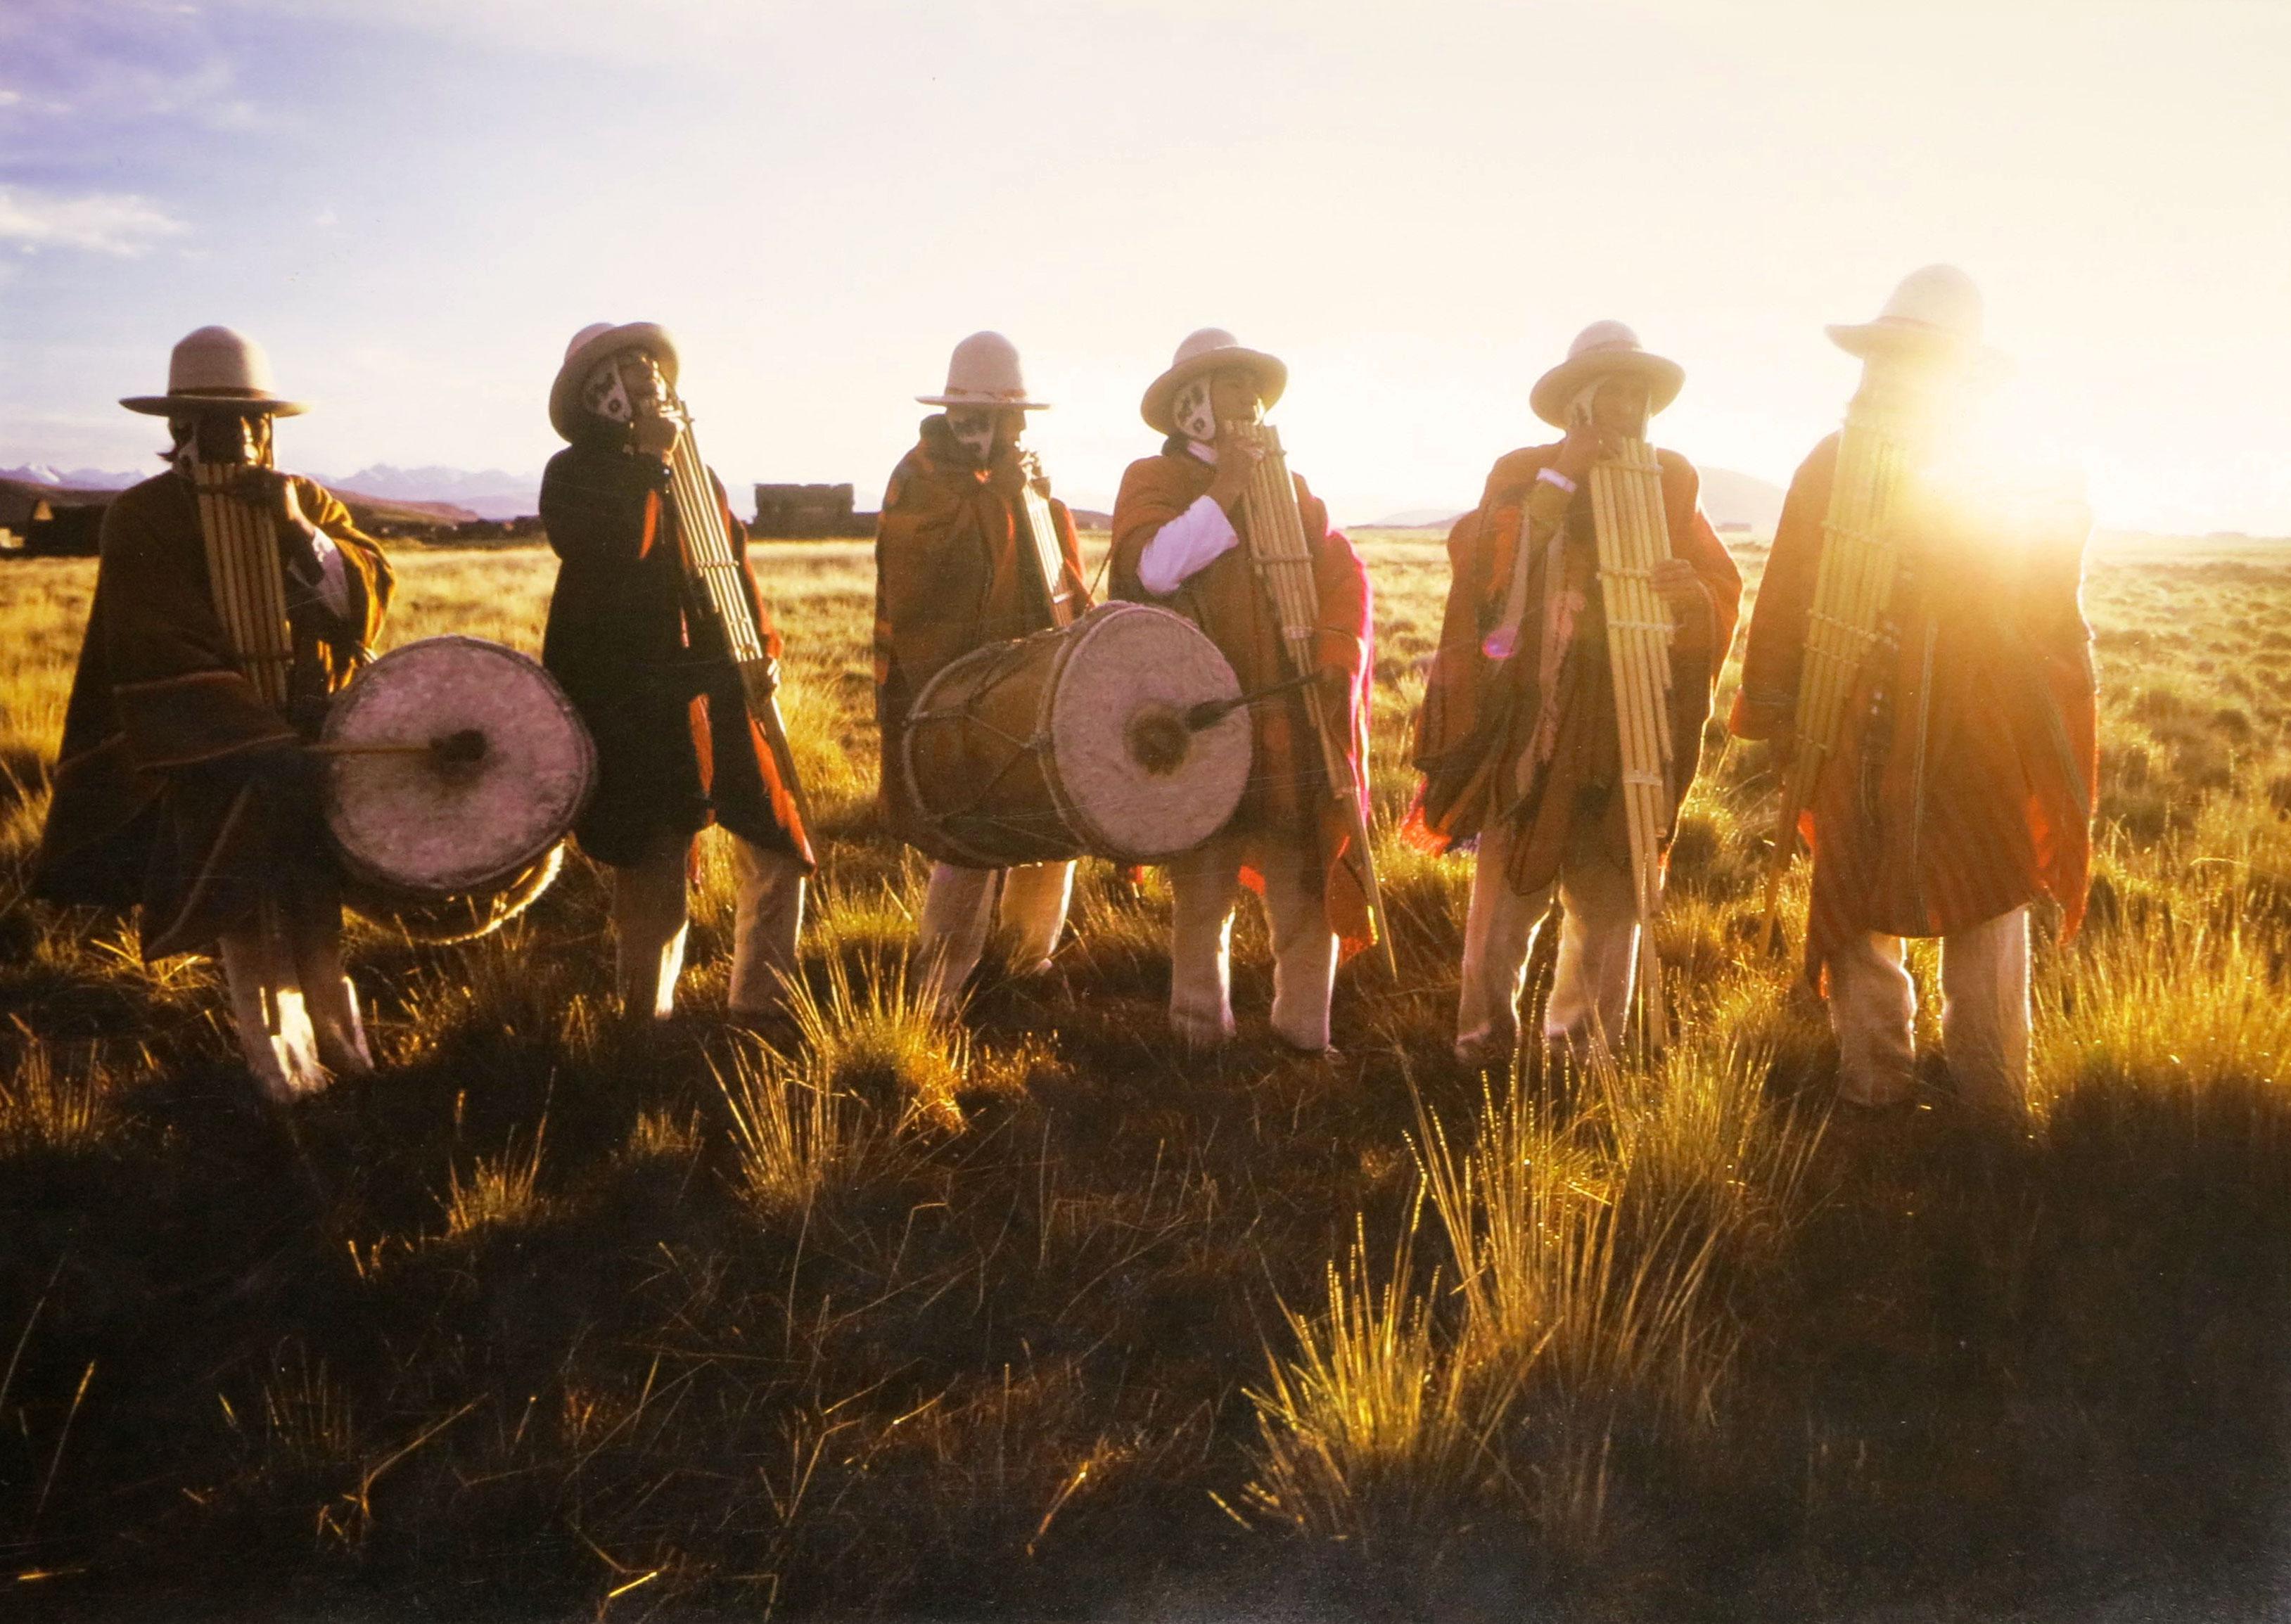 Ruphay im Altiplano am Tag - Pressefoto